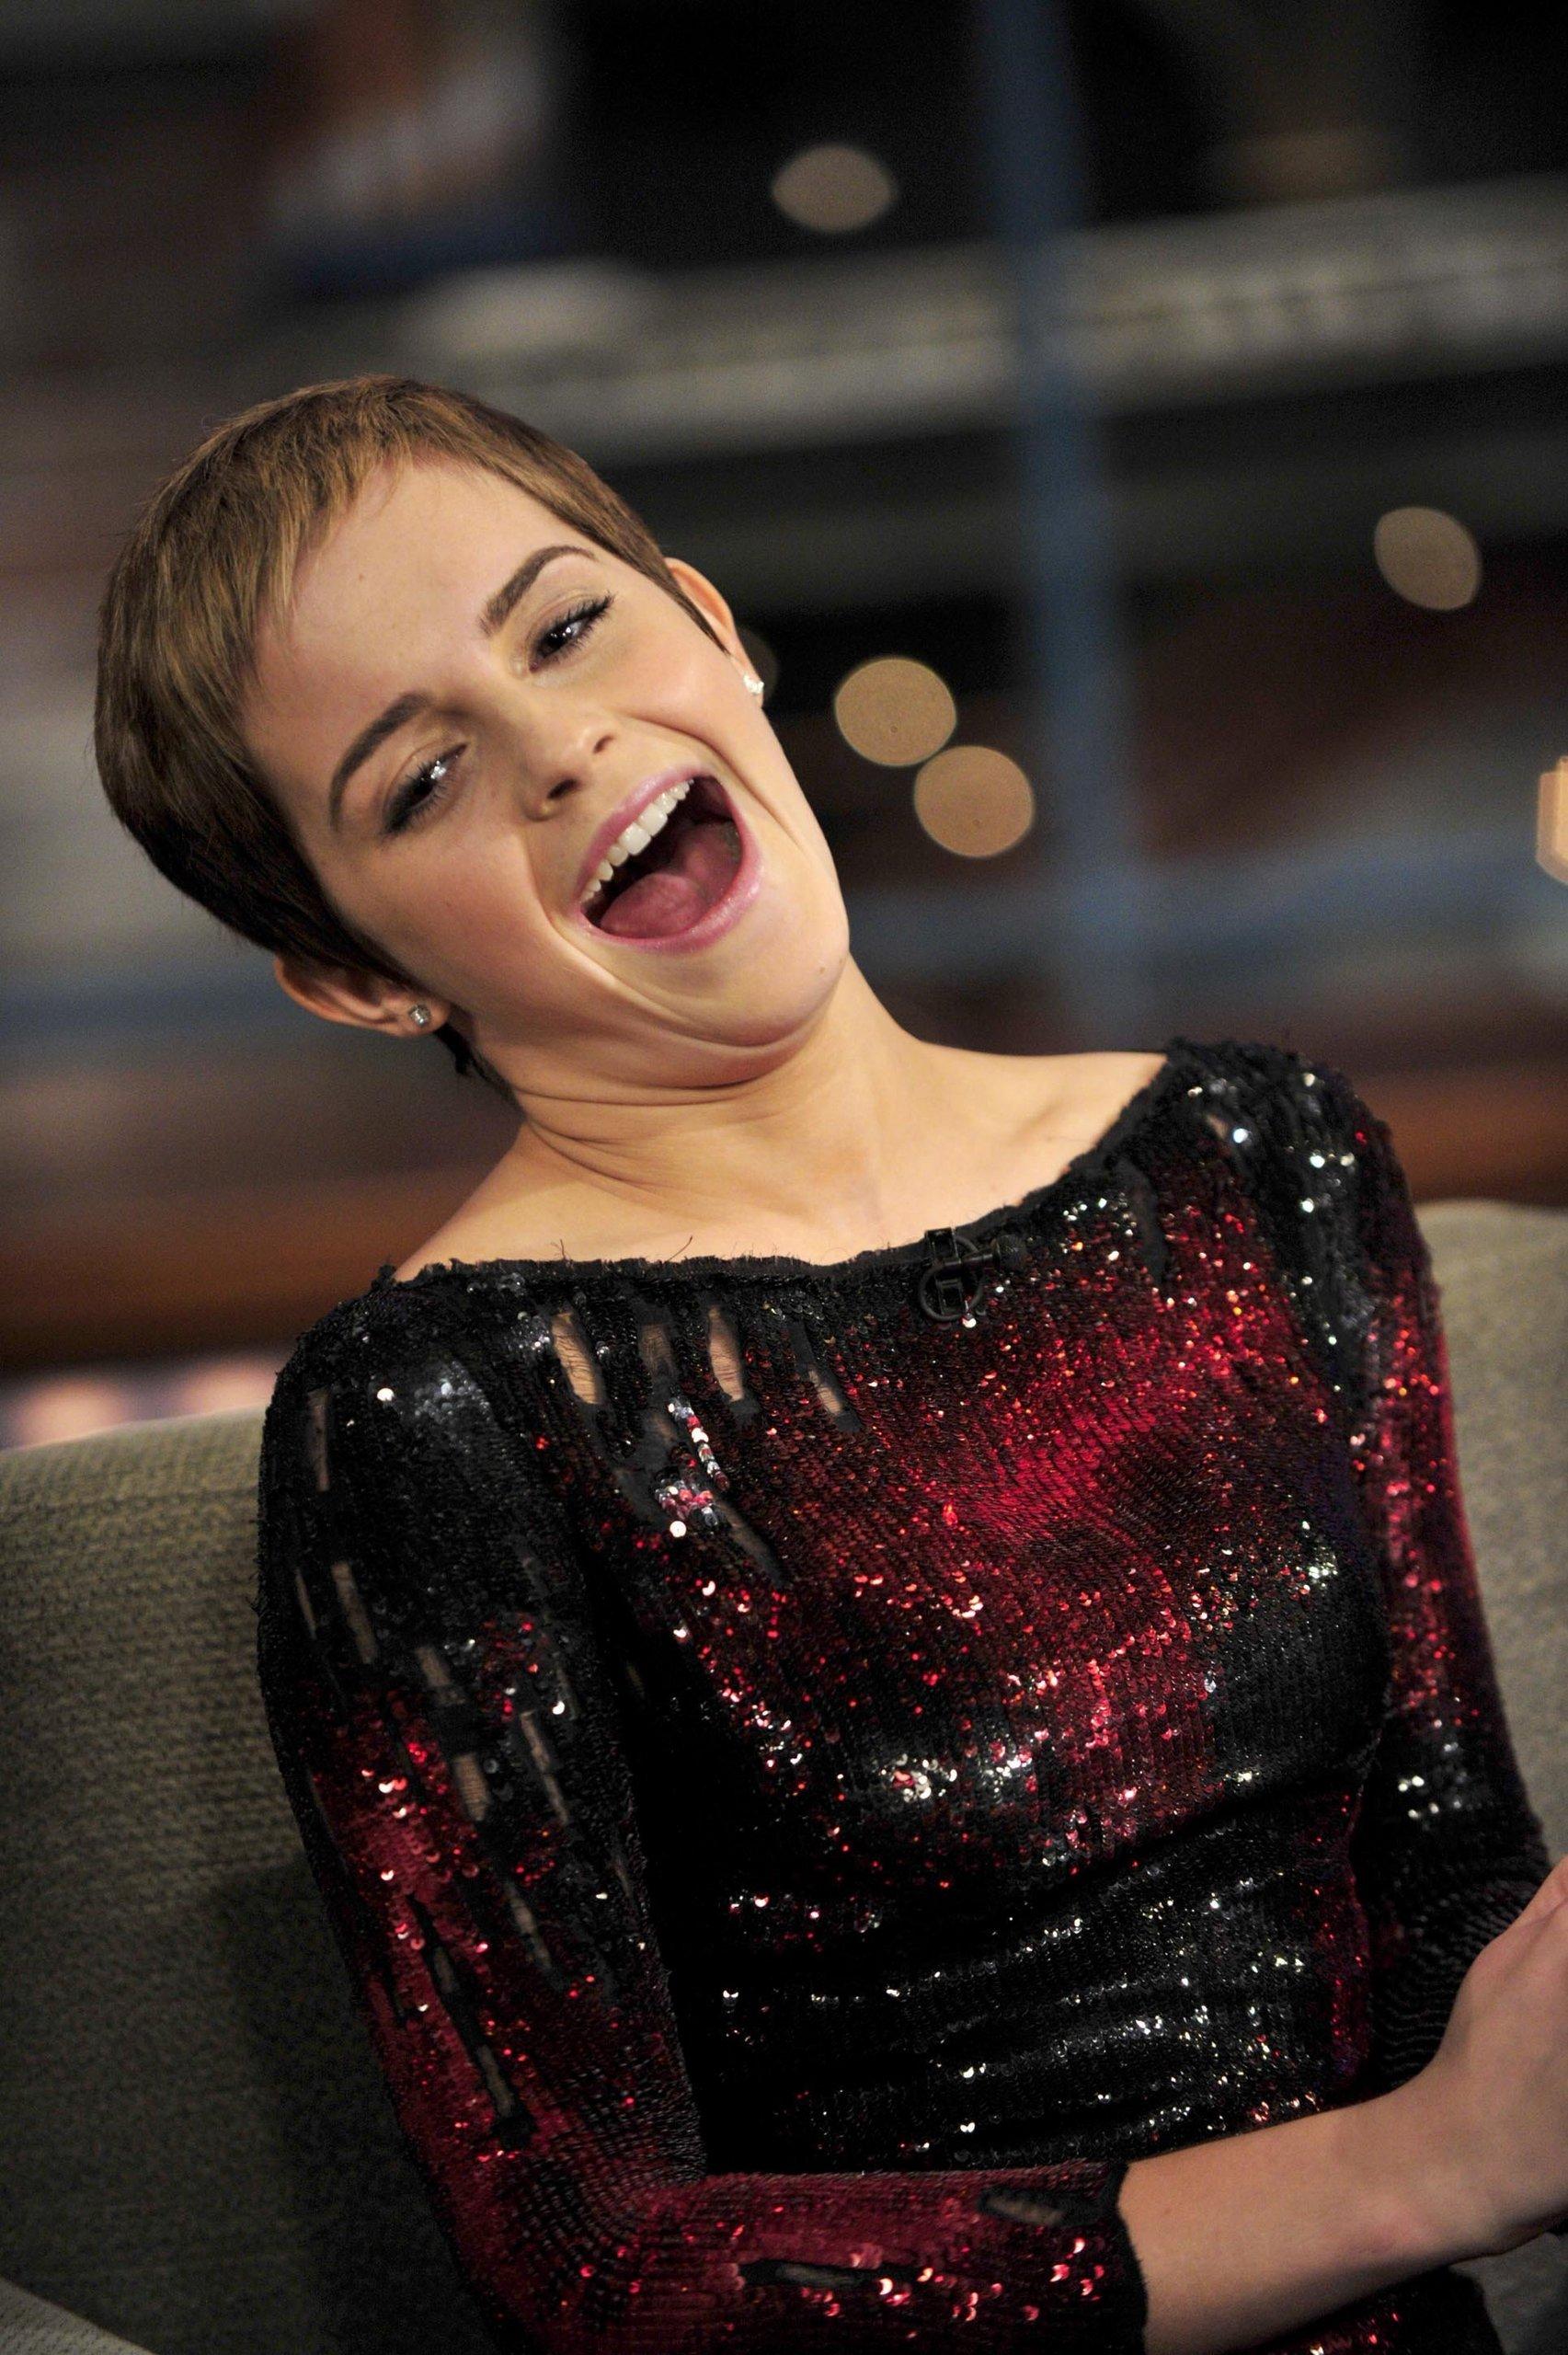 Driving Lessons Nyc >> Letterman (2010) - Emma Watson Photo (17025840) - Fanpop